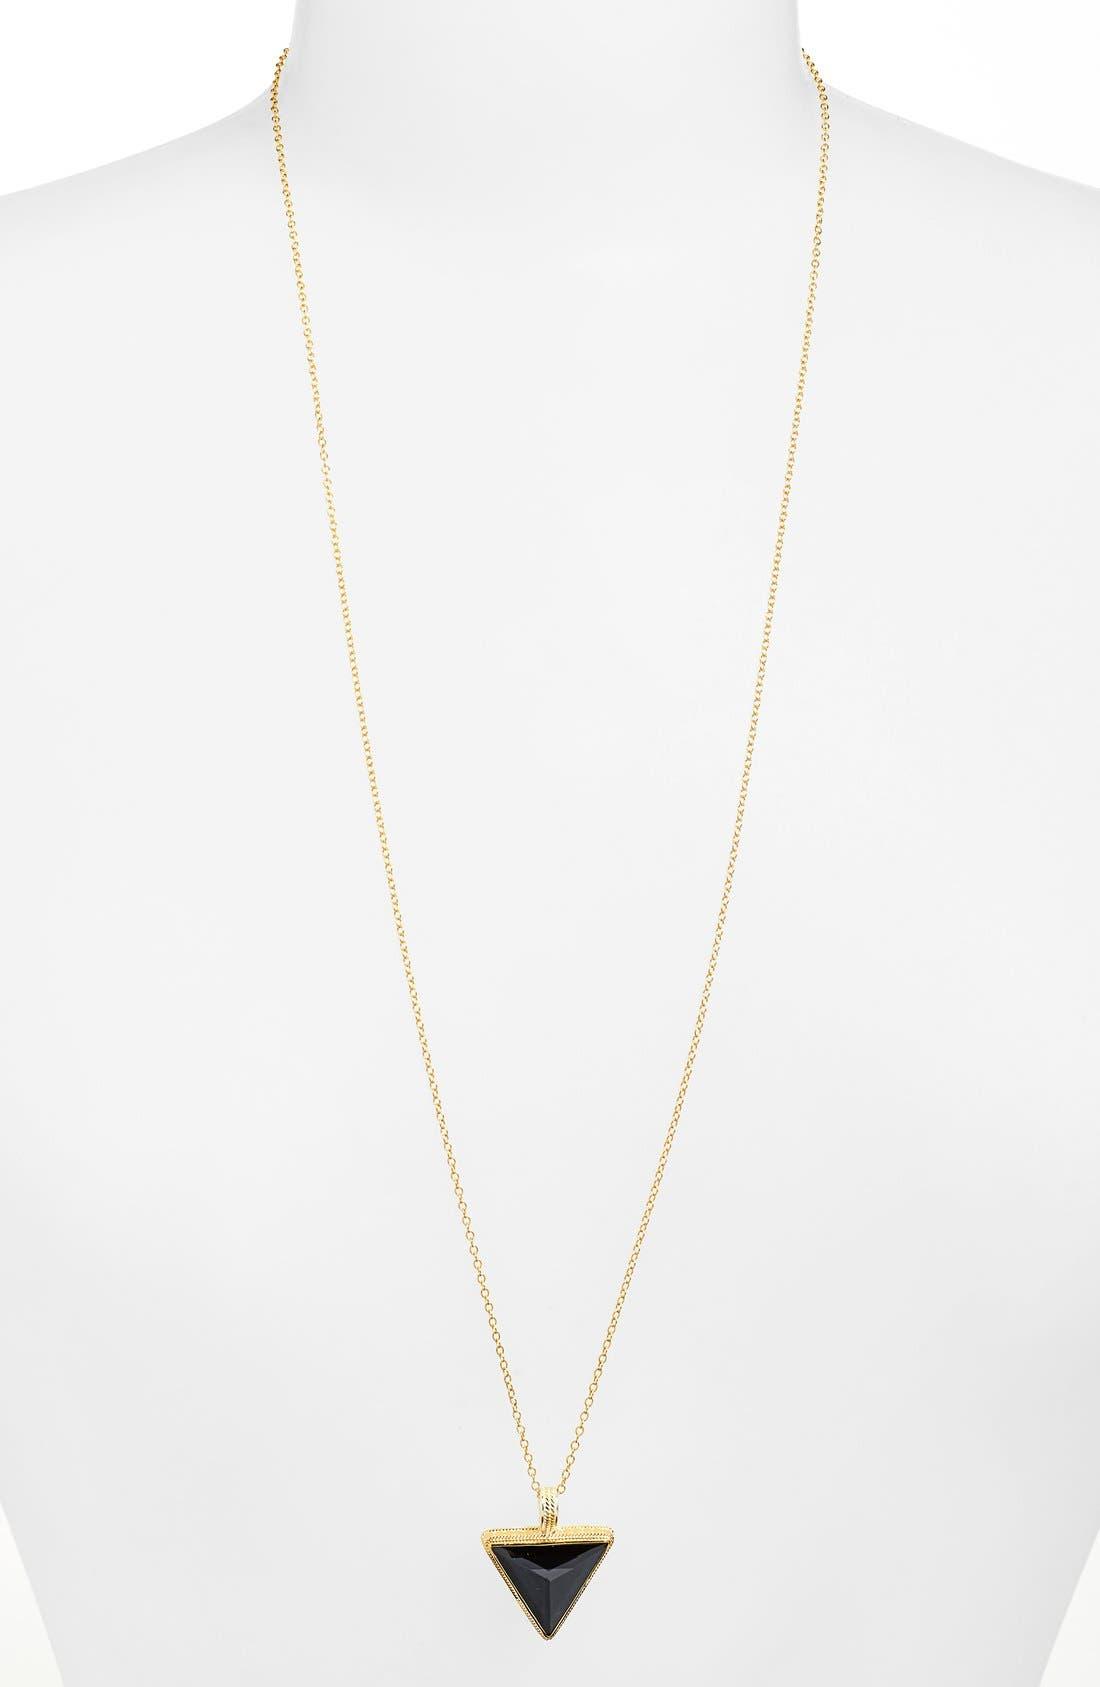 Main Image - Anna Beck 'Gili' Triangle Pendant Necklace